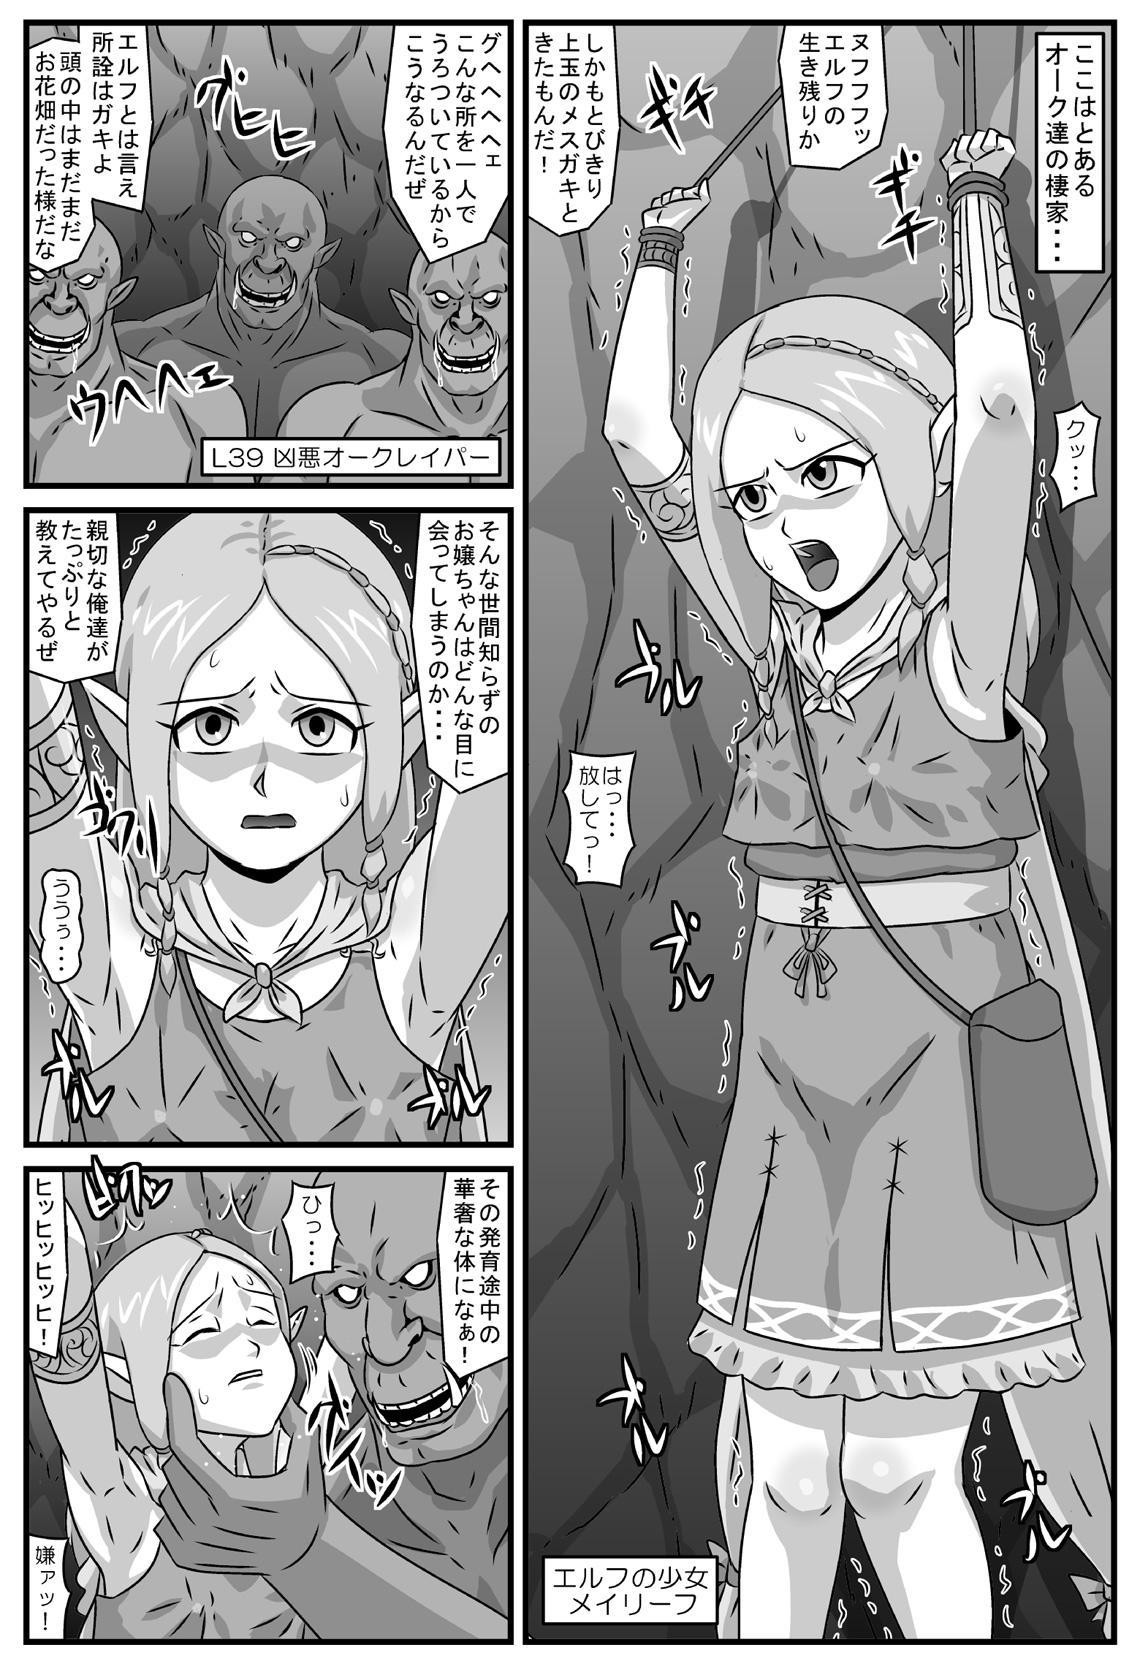 Elf Rinkan ~Kijin-tachi no Seien 1